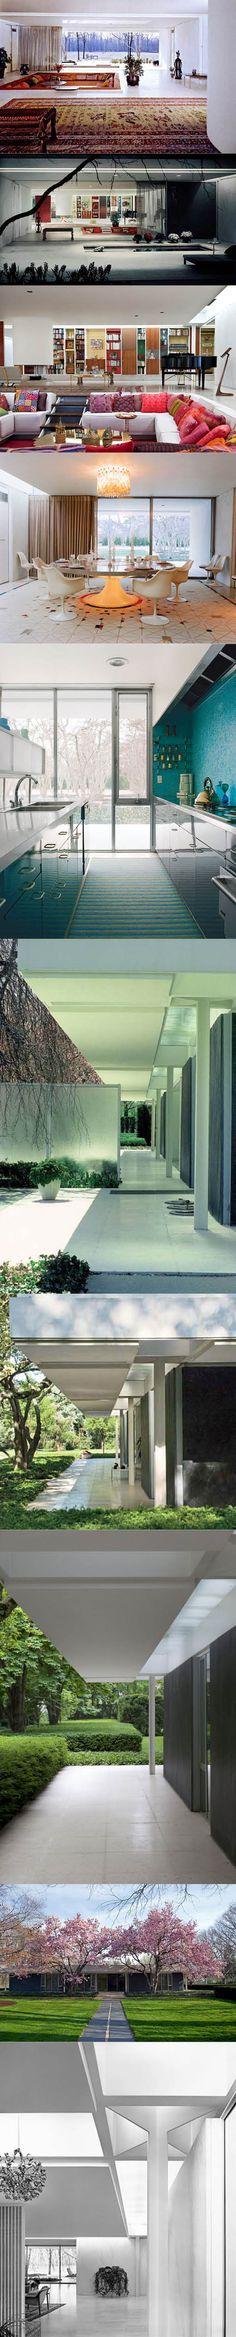 1953 Eero Saarinen - Miller House / Columbus Indiana USA / concrete / white / Finland